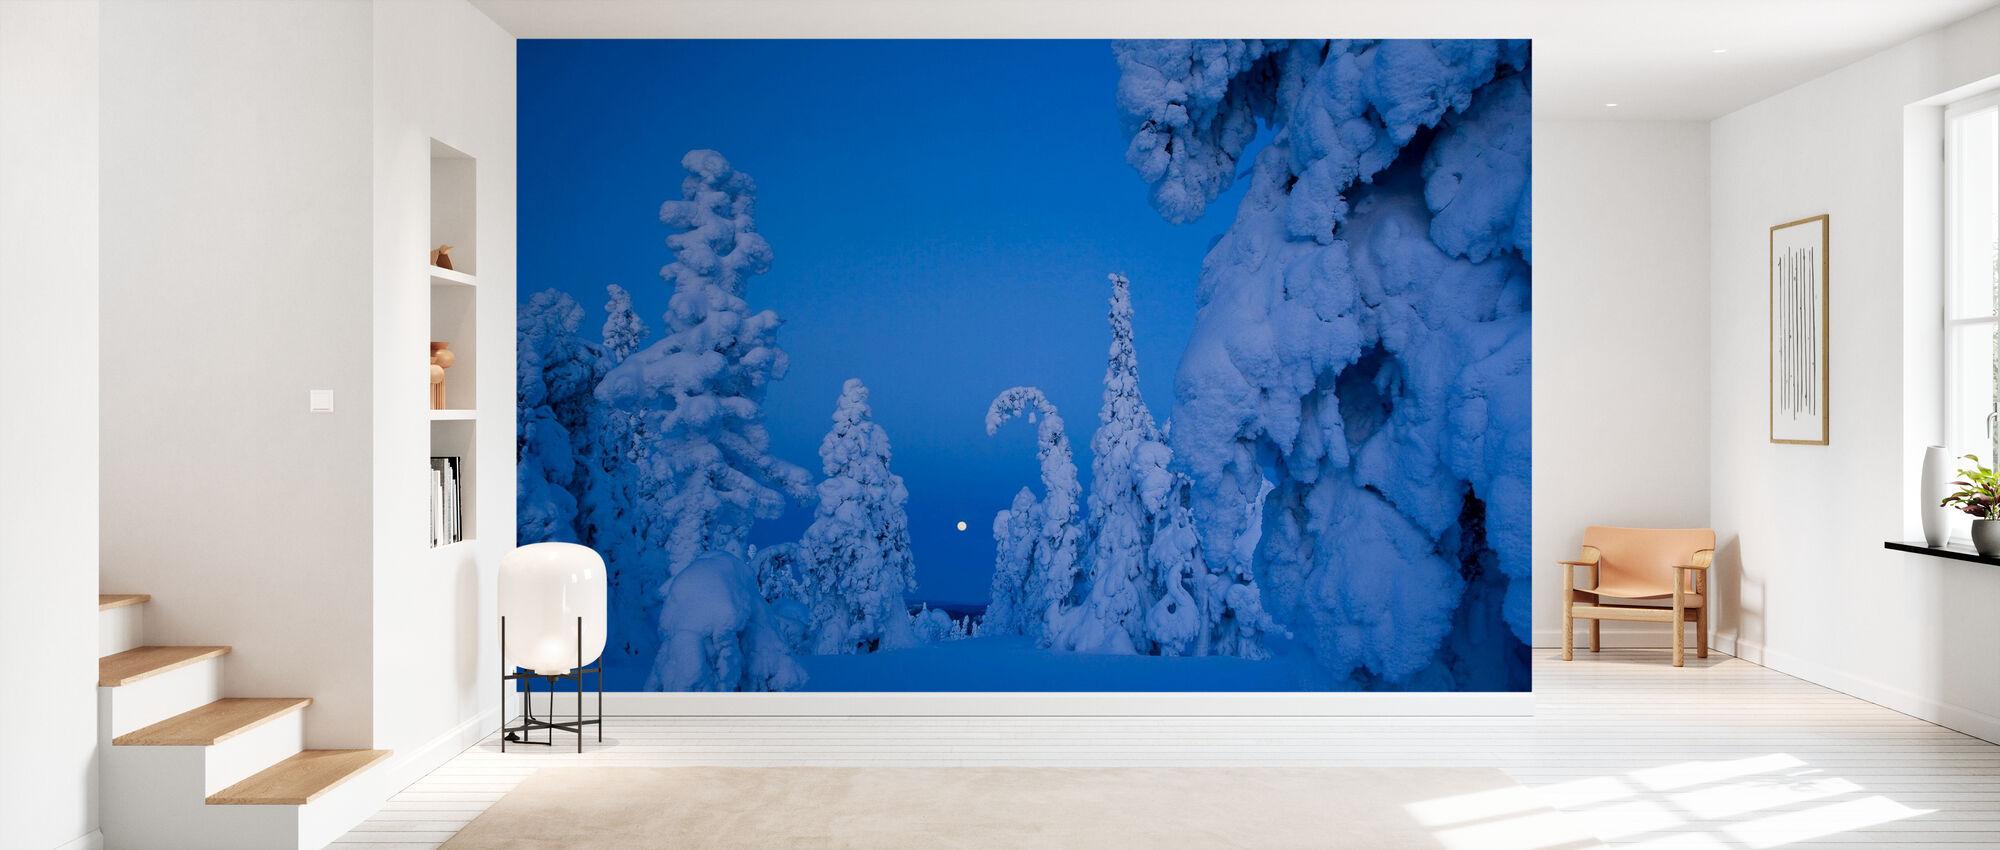 Sneeuw beladen Taiga Bos - Behang - Gang